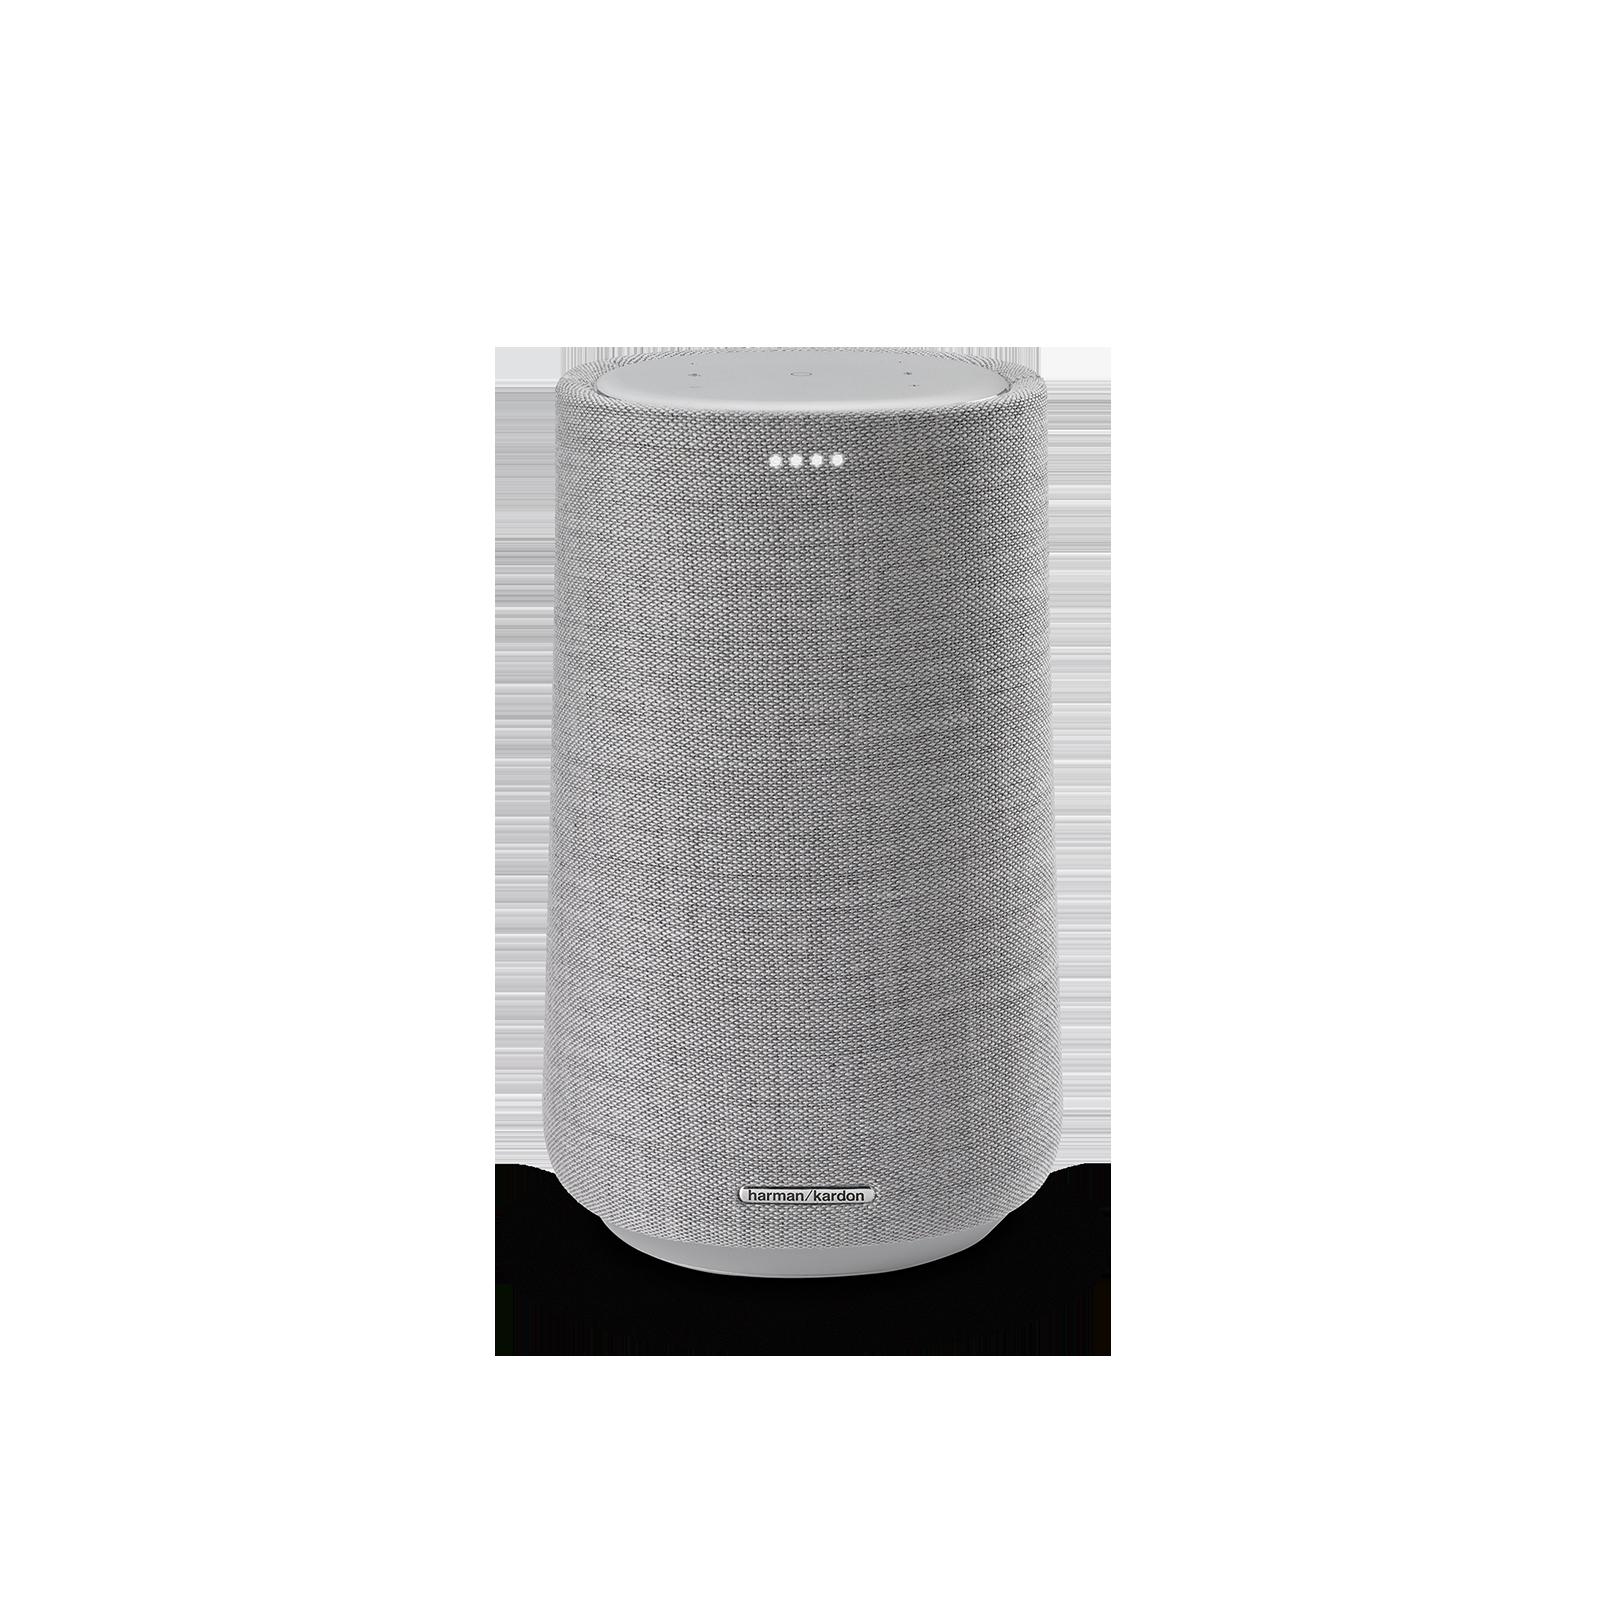 Harman Kardon Citation 100 - Grey - The smallest, smartest home speaker with impactful sound - Front